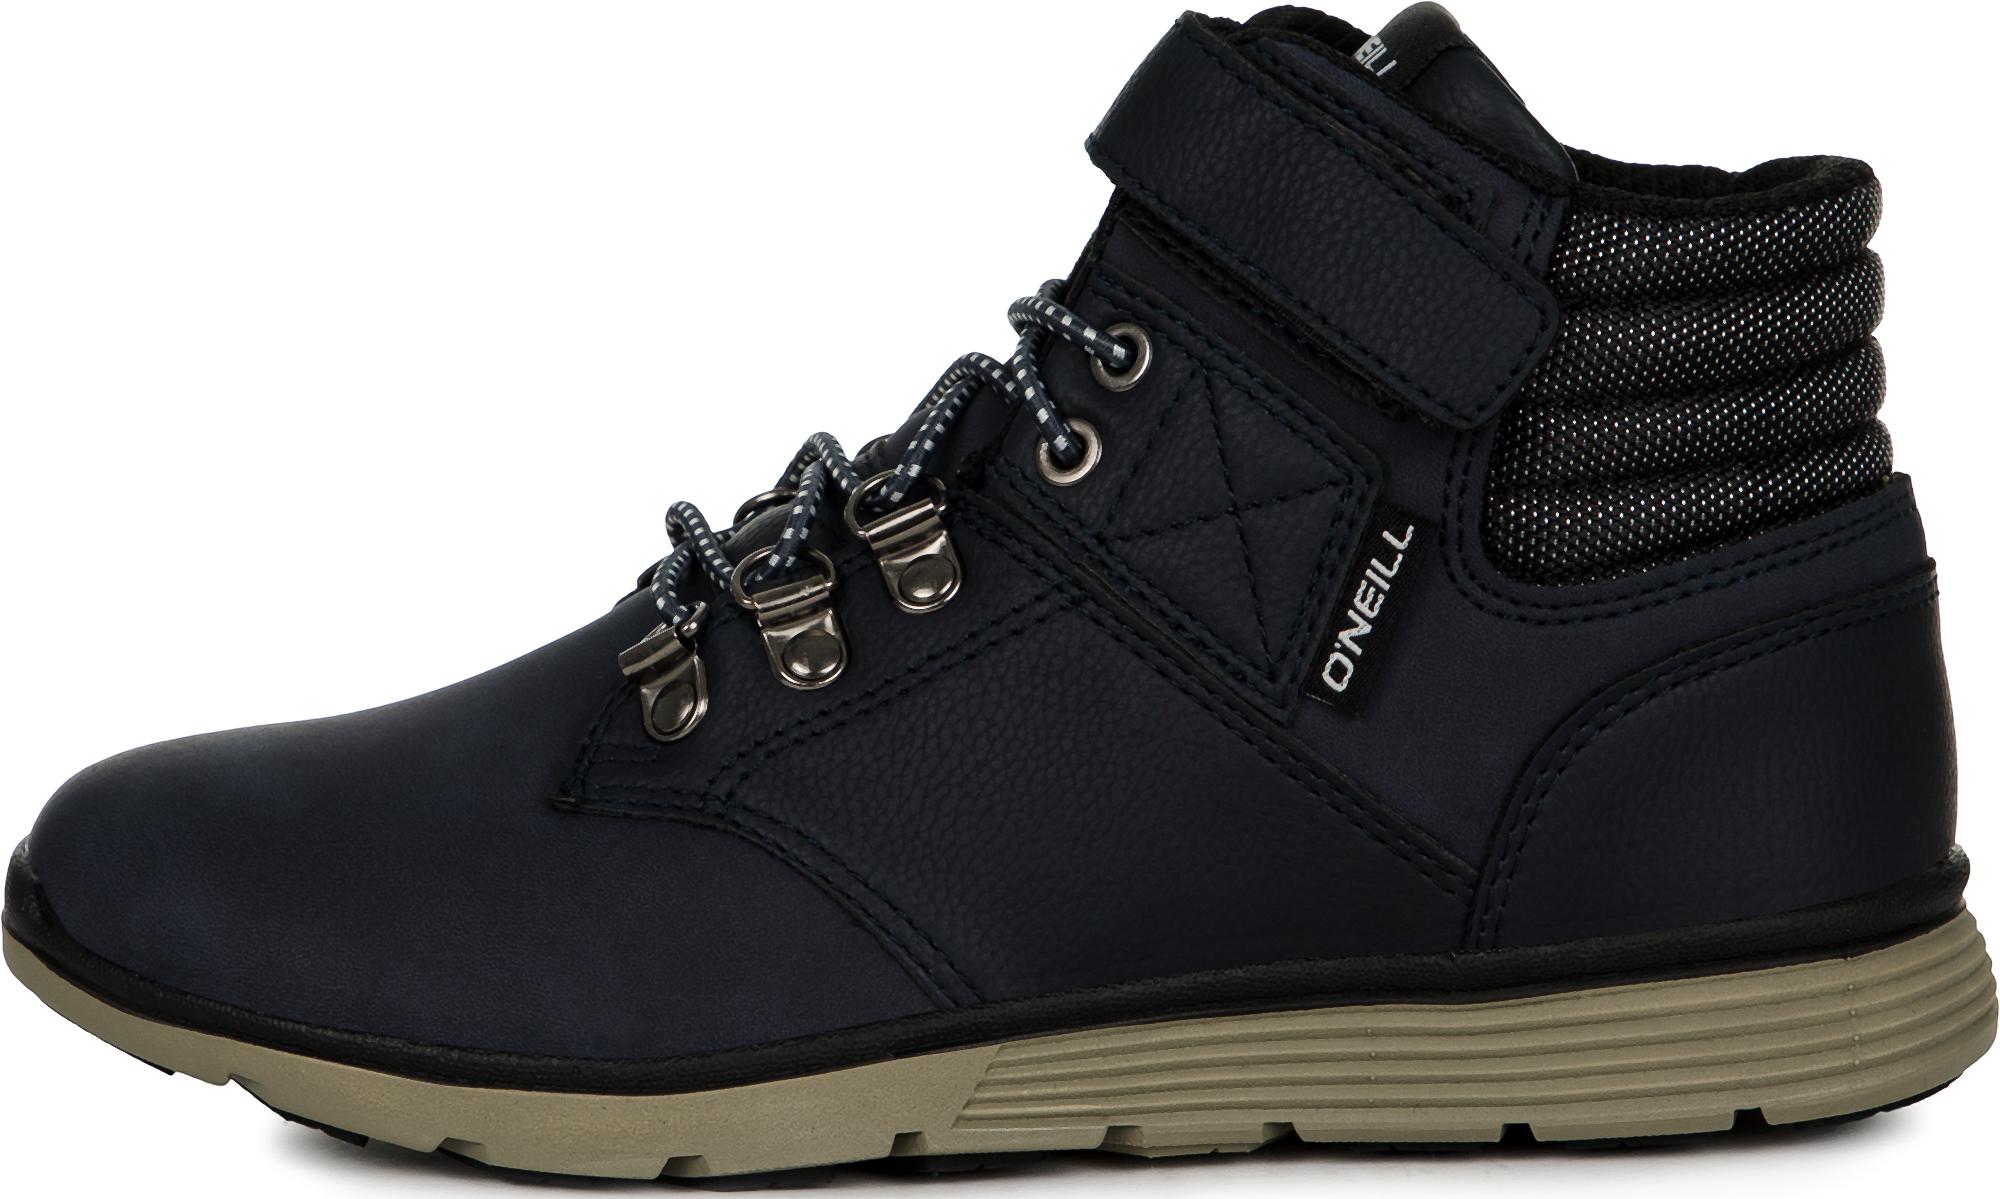 ONeill Ботинки утепленные для мальчиков Railer, размер 38